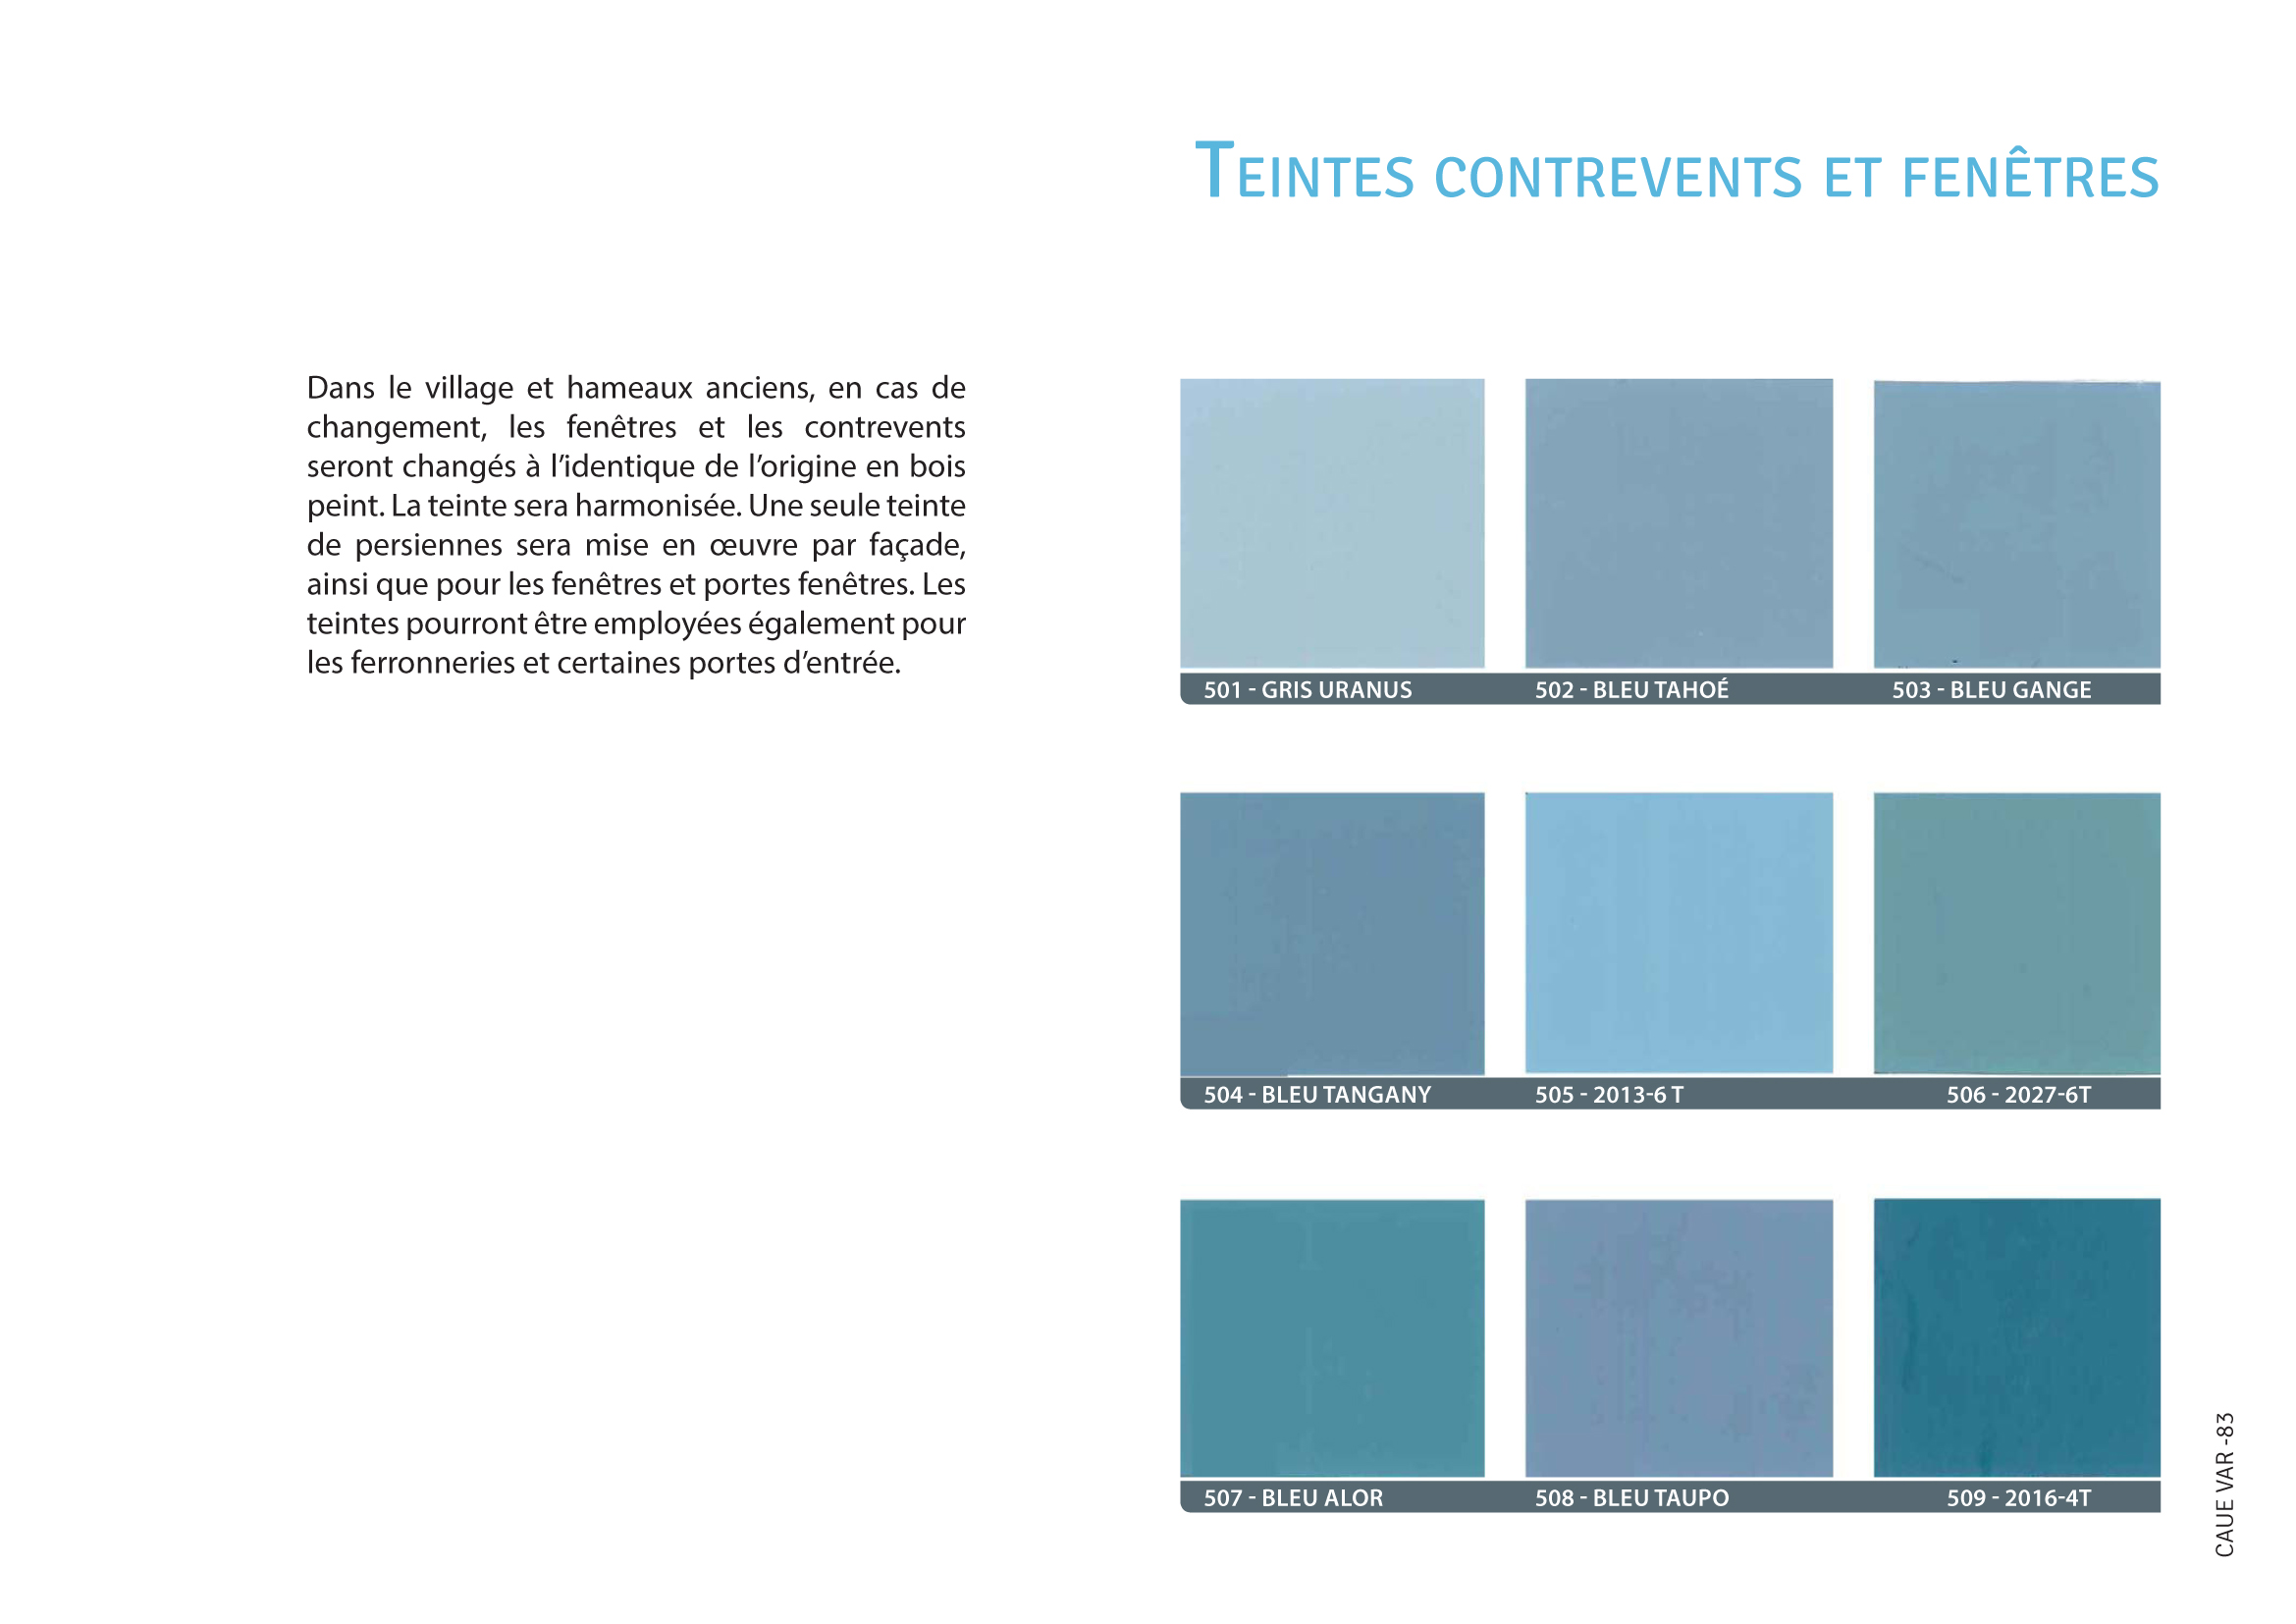 08_teintes_contrevents_et_fenetres-jpg